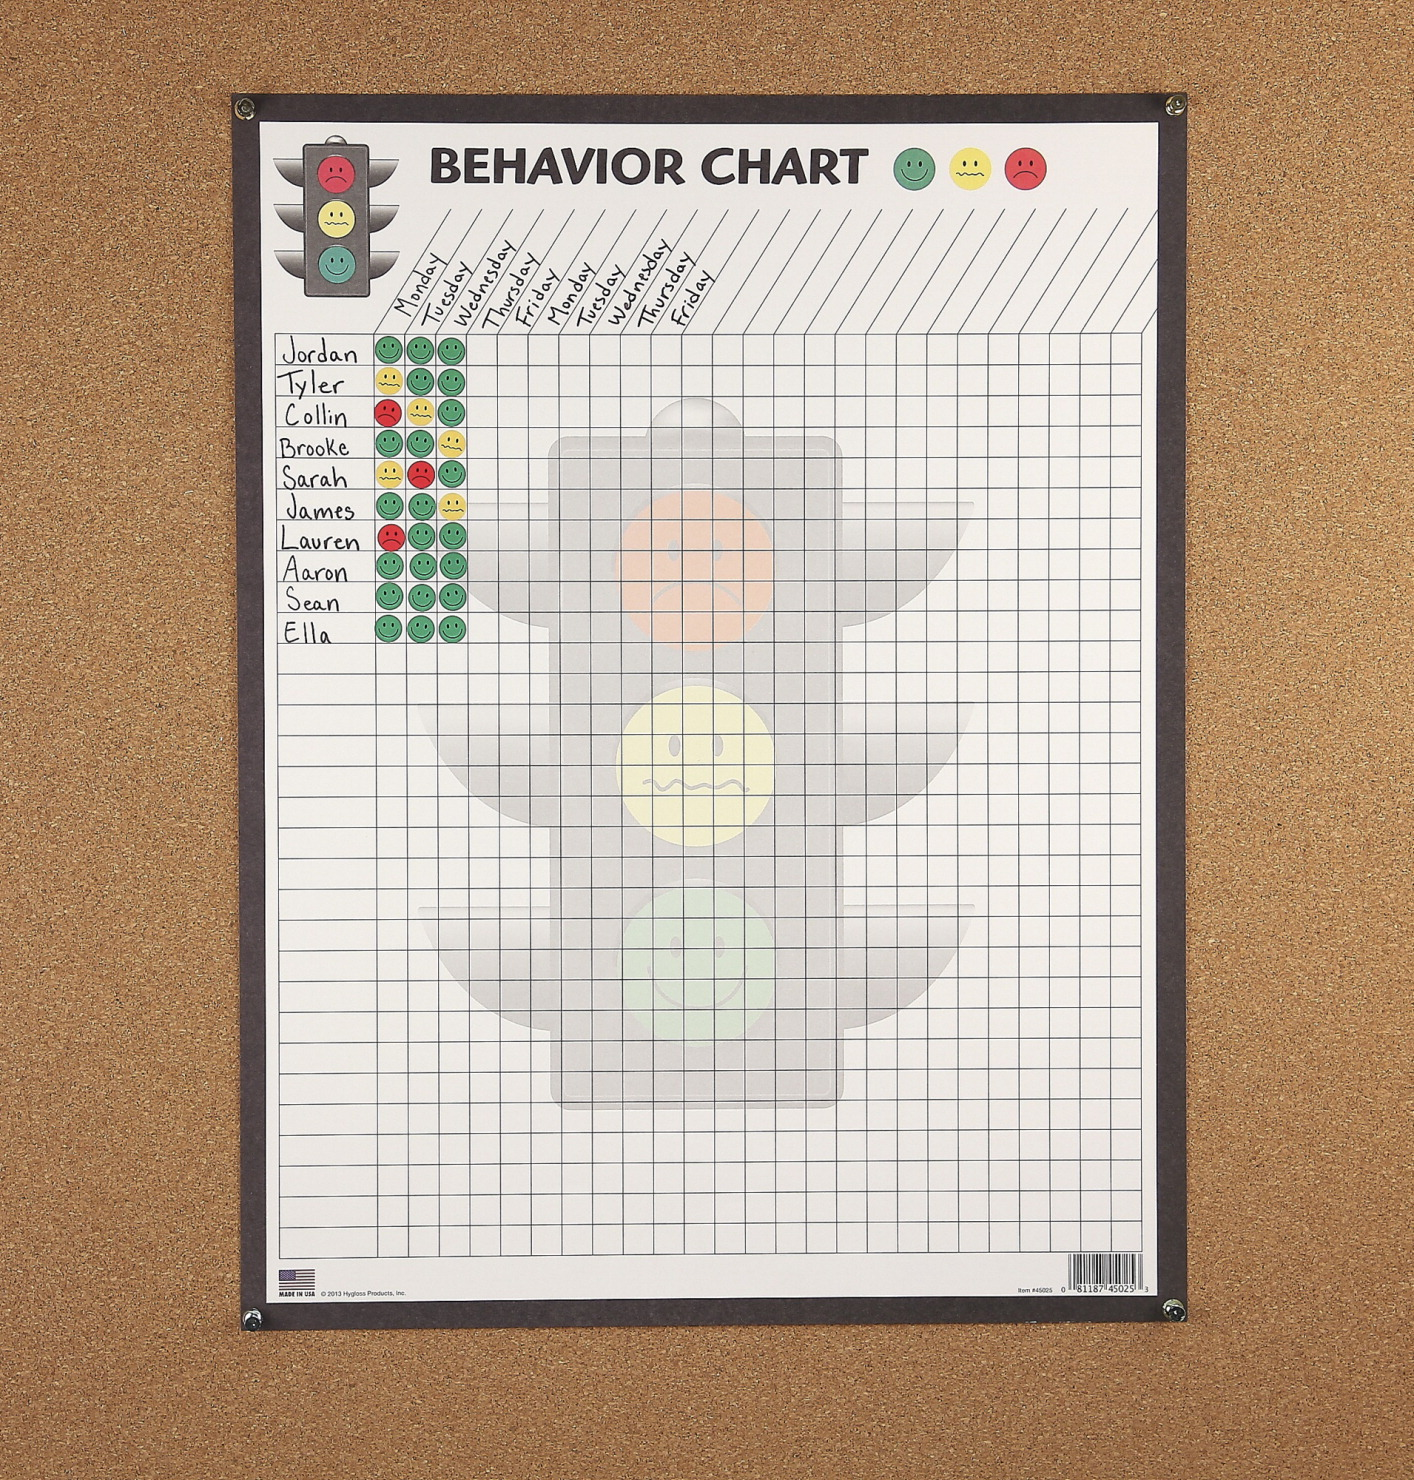 Hygloss Traffic Light Behavior Chart 17 x 22 inches